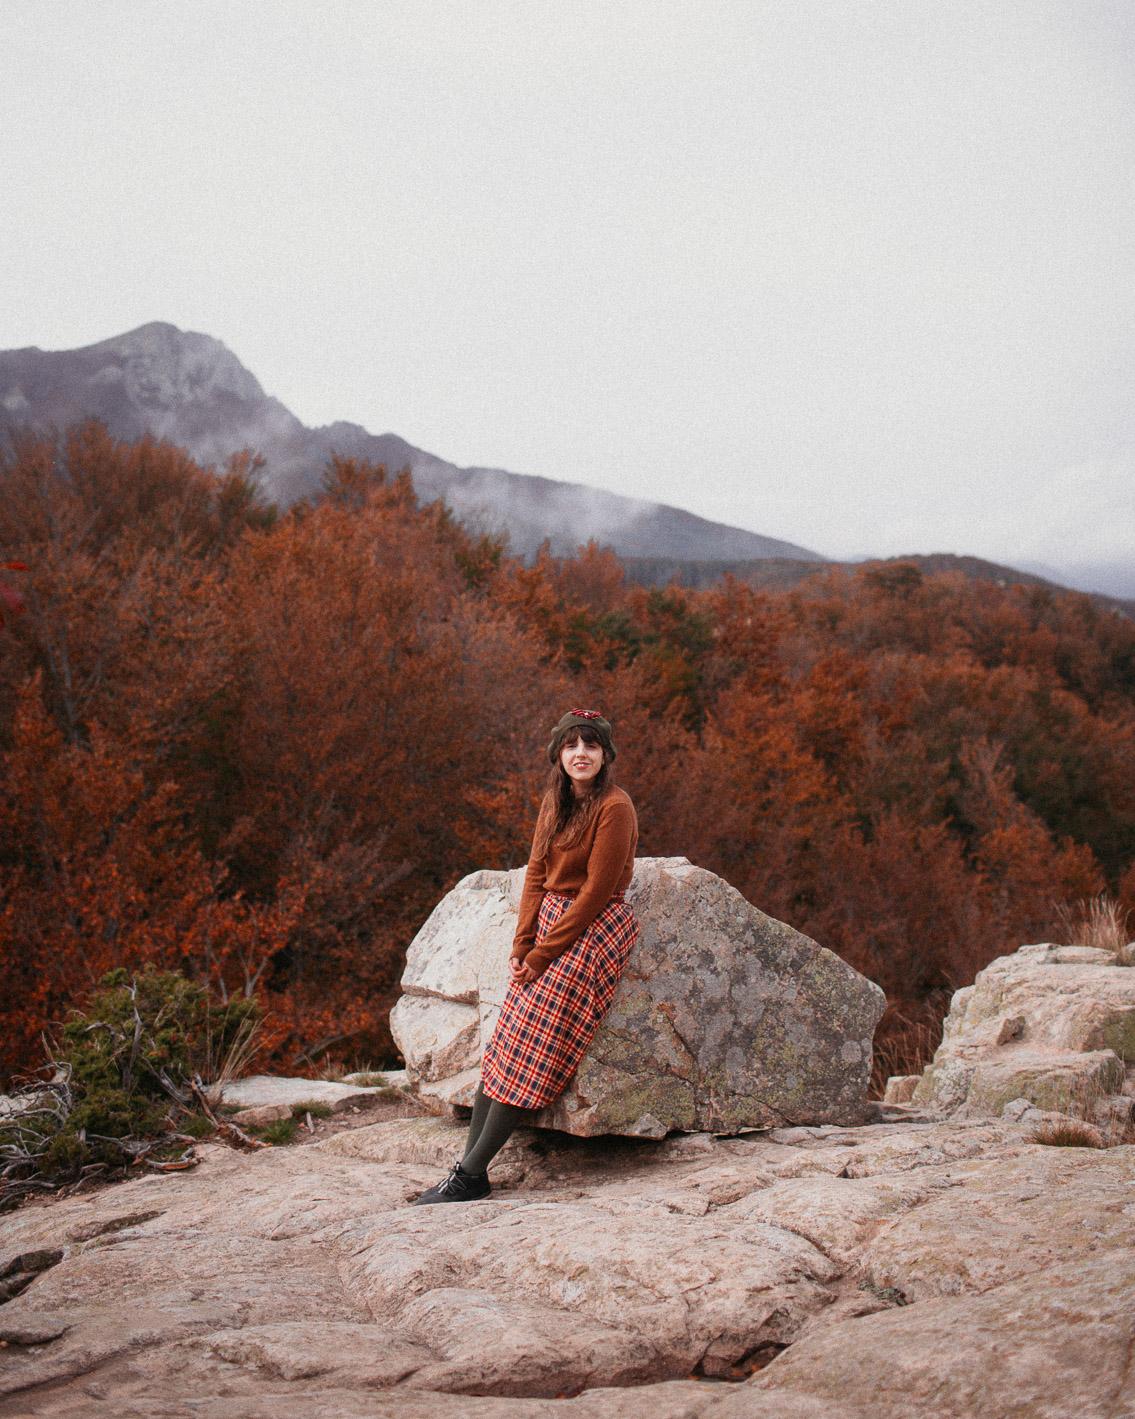 Montseny Turó de Murou fall colors (otoño, tardor) - The cat, you and us